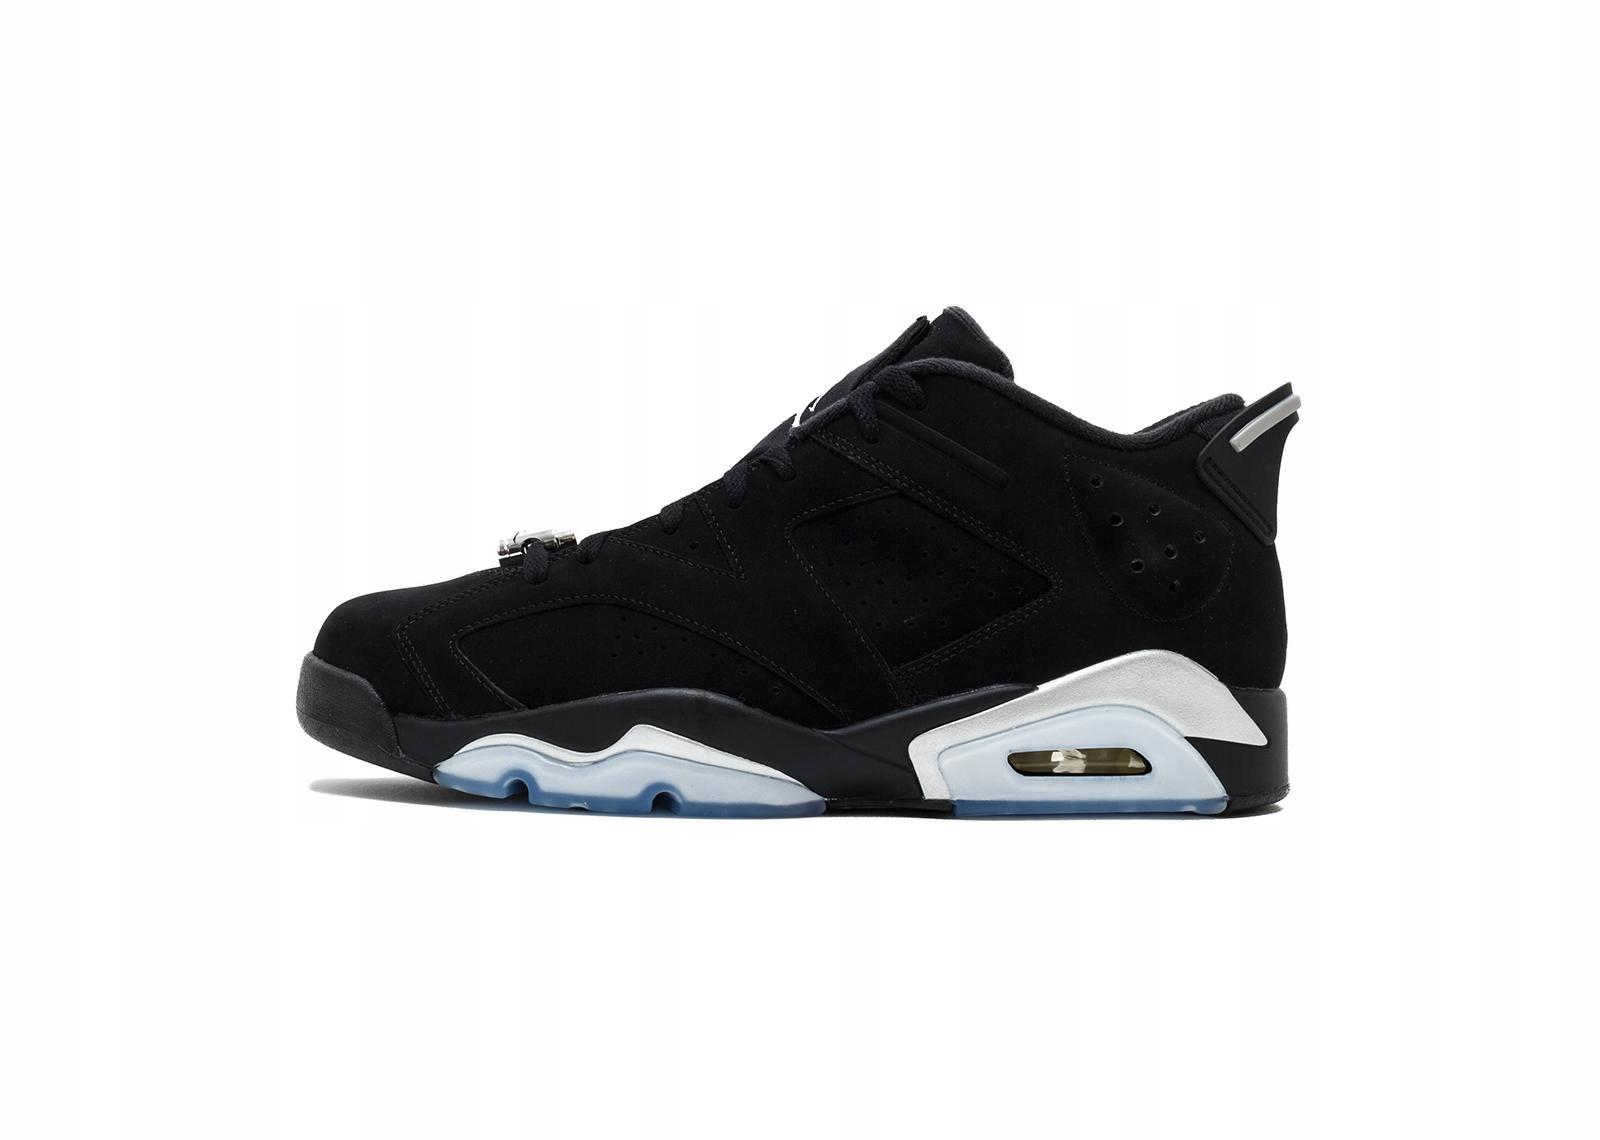 Basketbalové topánky Nike Air Jordan 6 RETRO